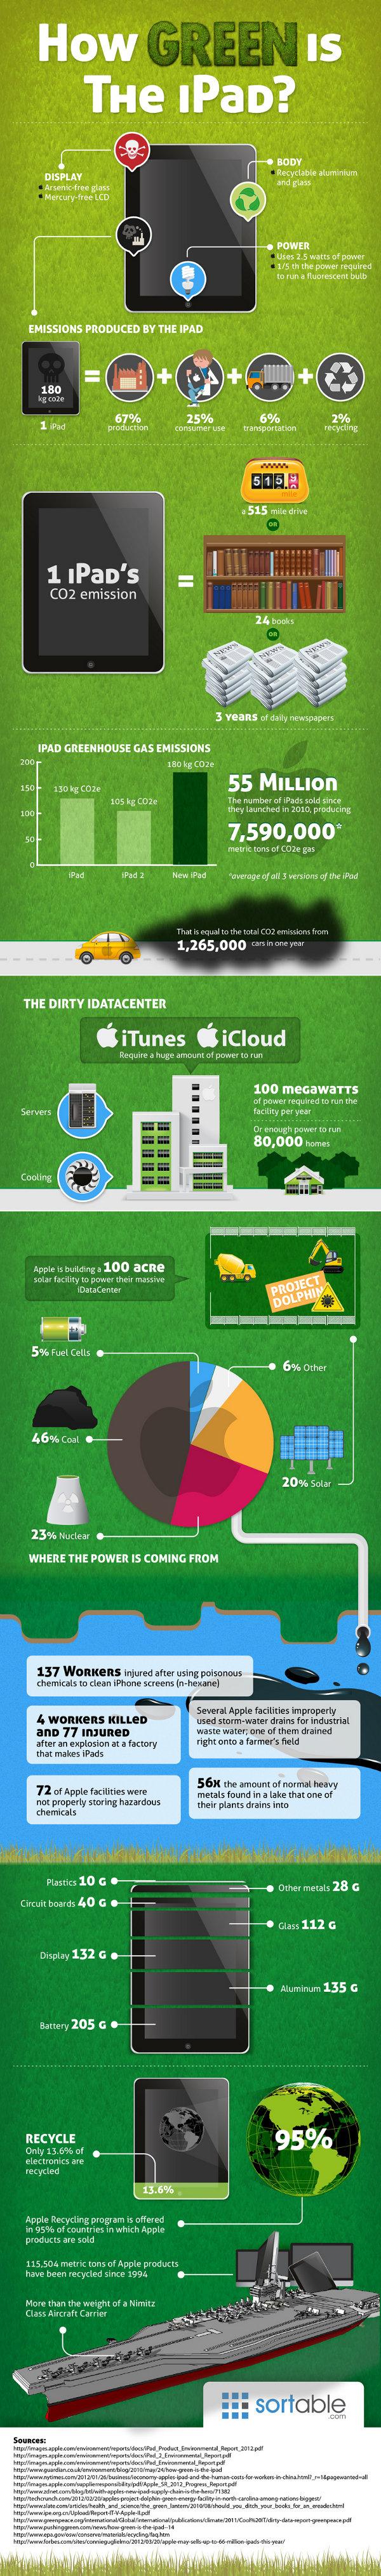 How Green is the iPad? [Infographic] Groen, Ipad